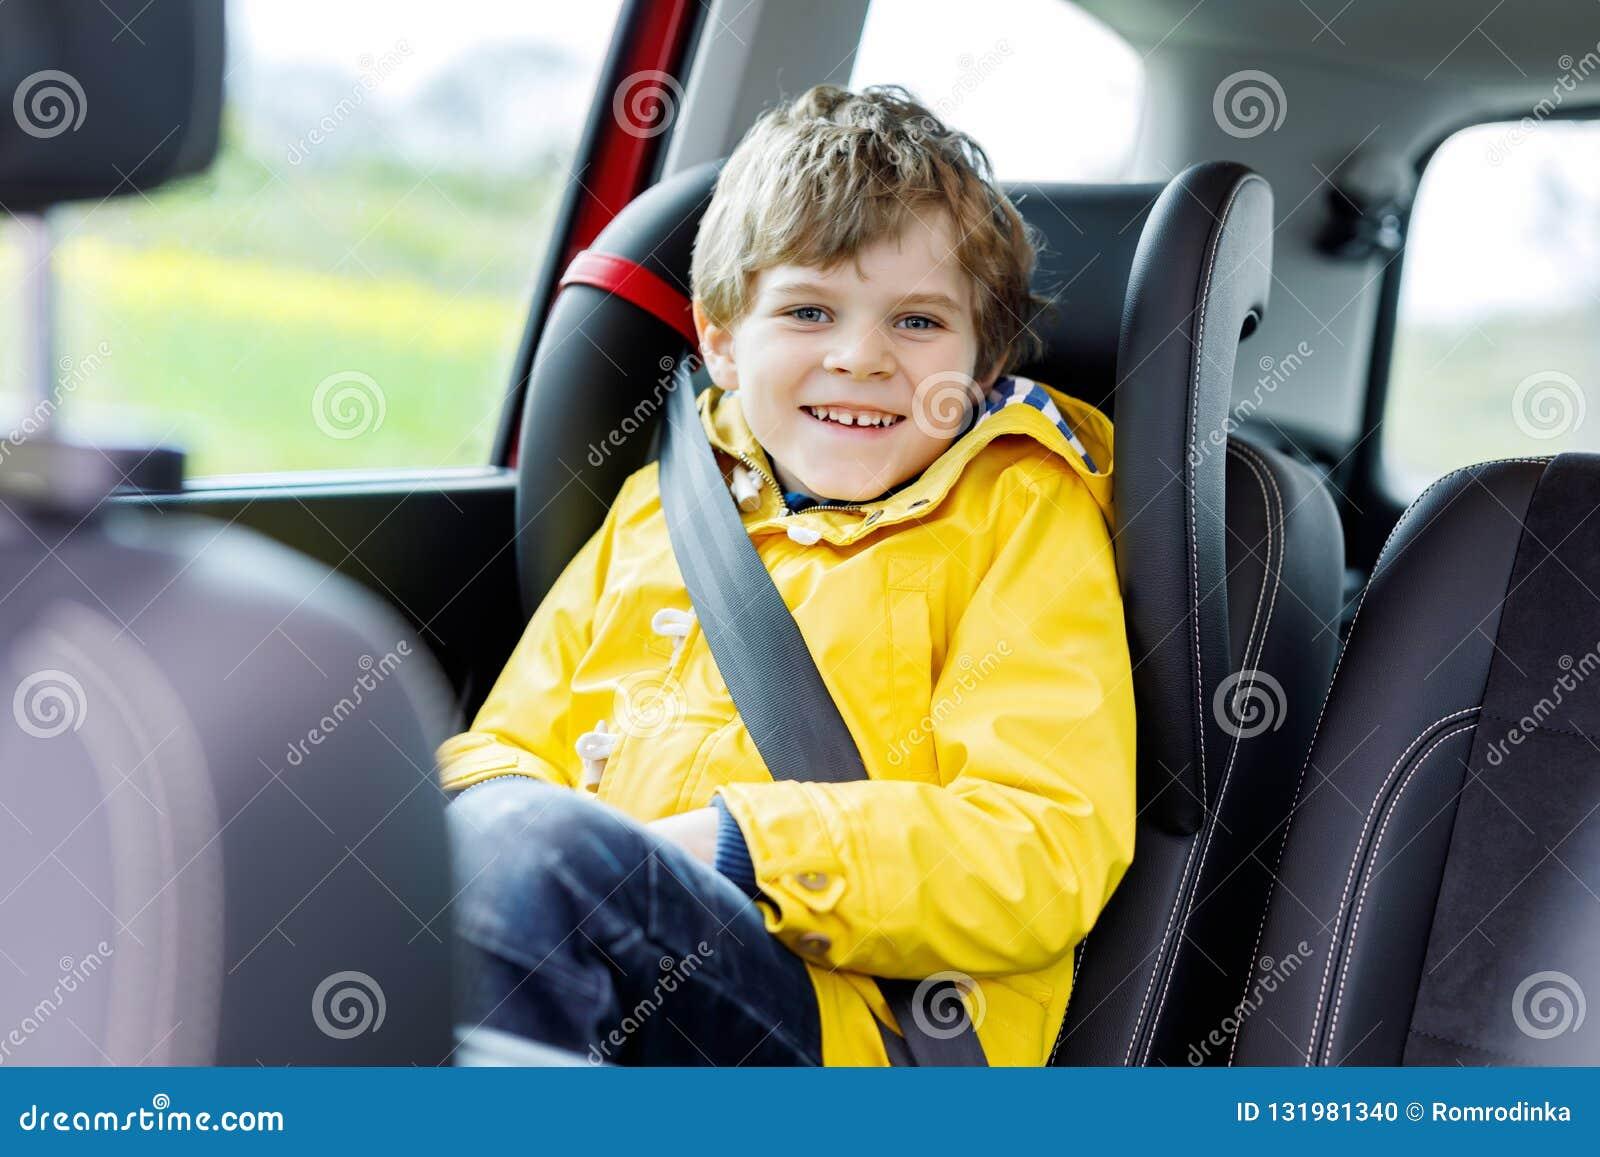 057998b46 Adorable cute preschool kid boy sitting in car in yellow rain coat. Little  school child